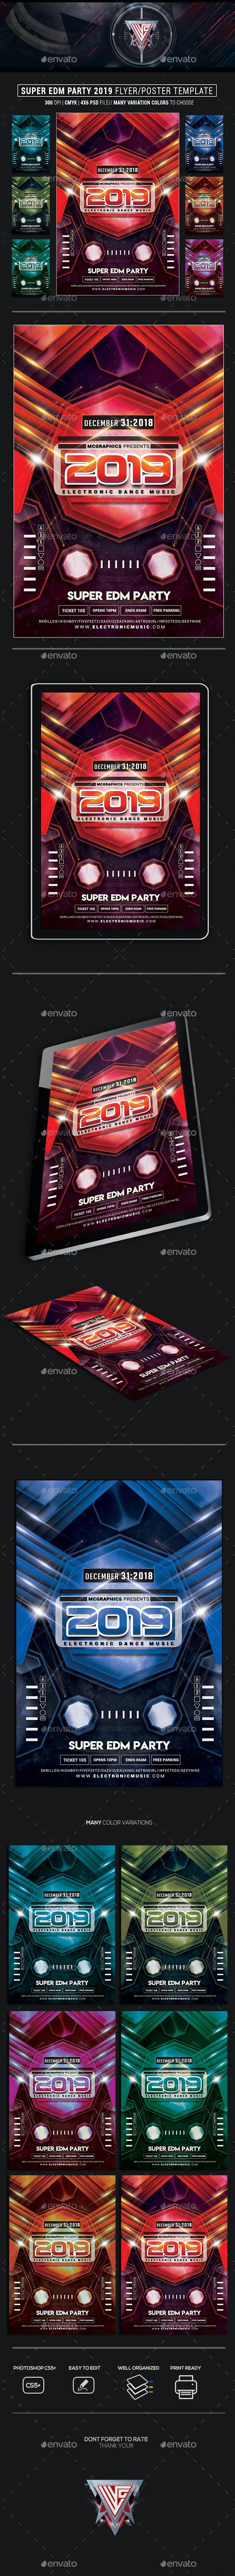 Super EDM Party 2019 Photoshop Flyer Template - Flyers Print Templates